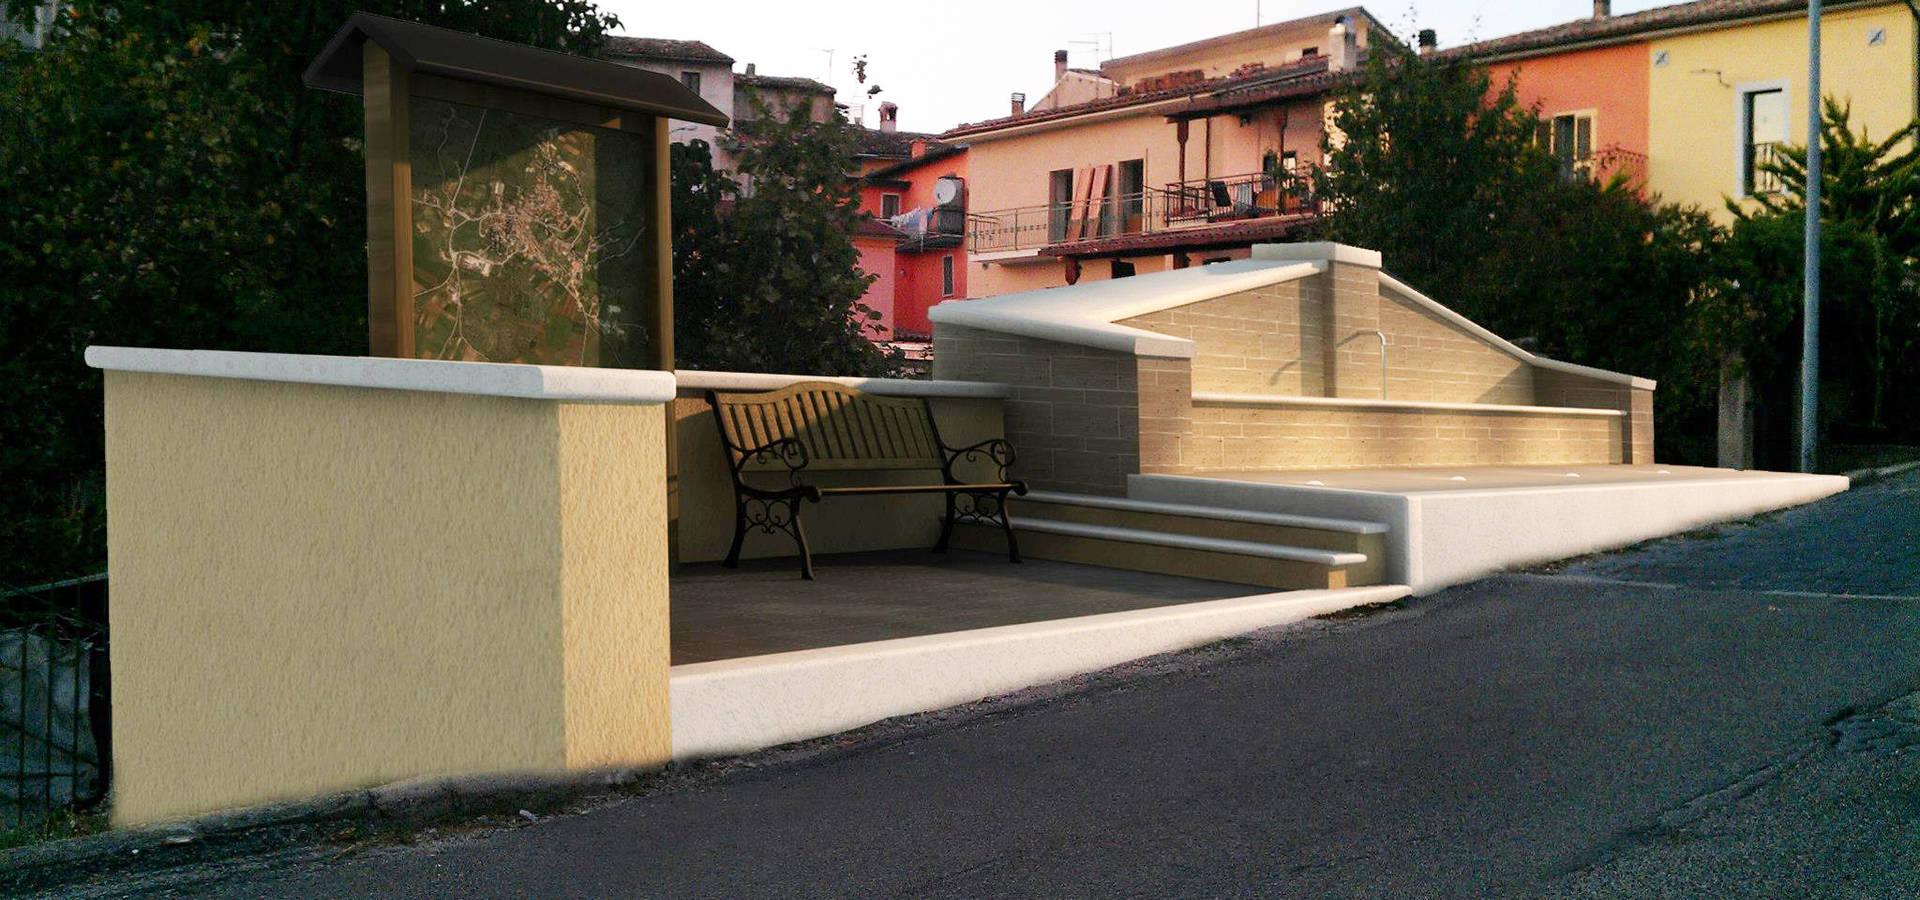 Studio Tecnico Arch Simone Zigrossi